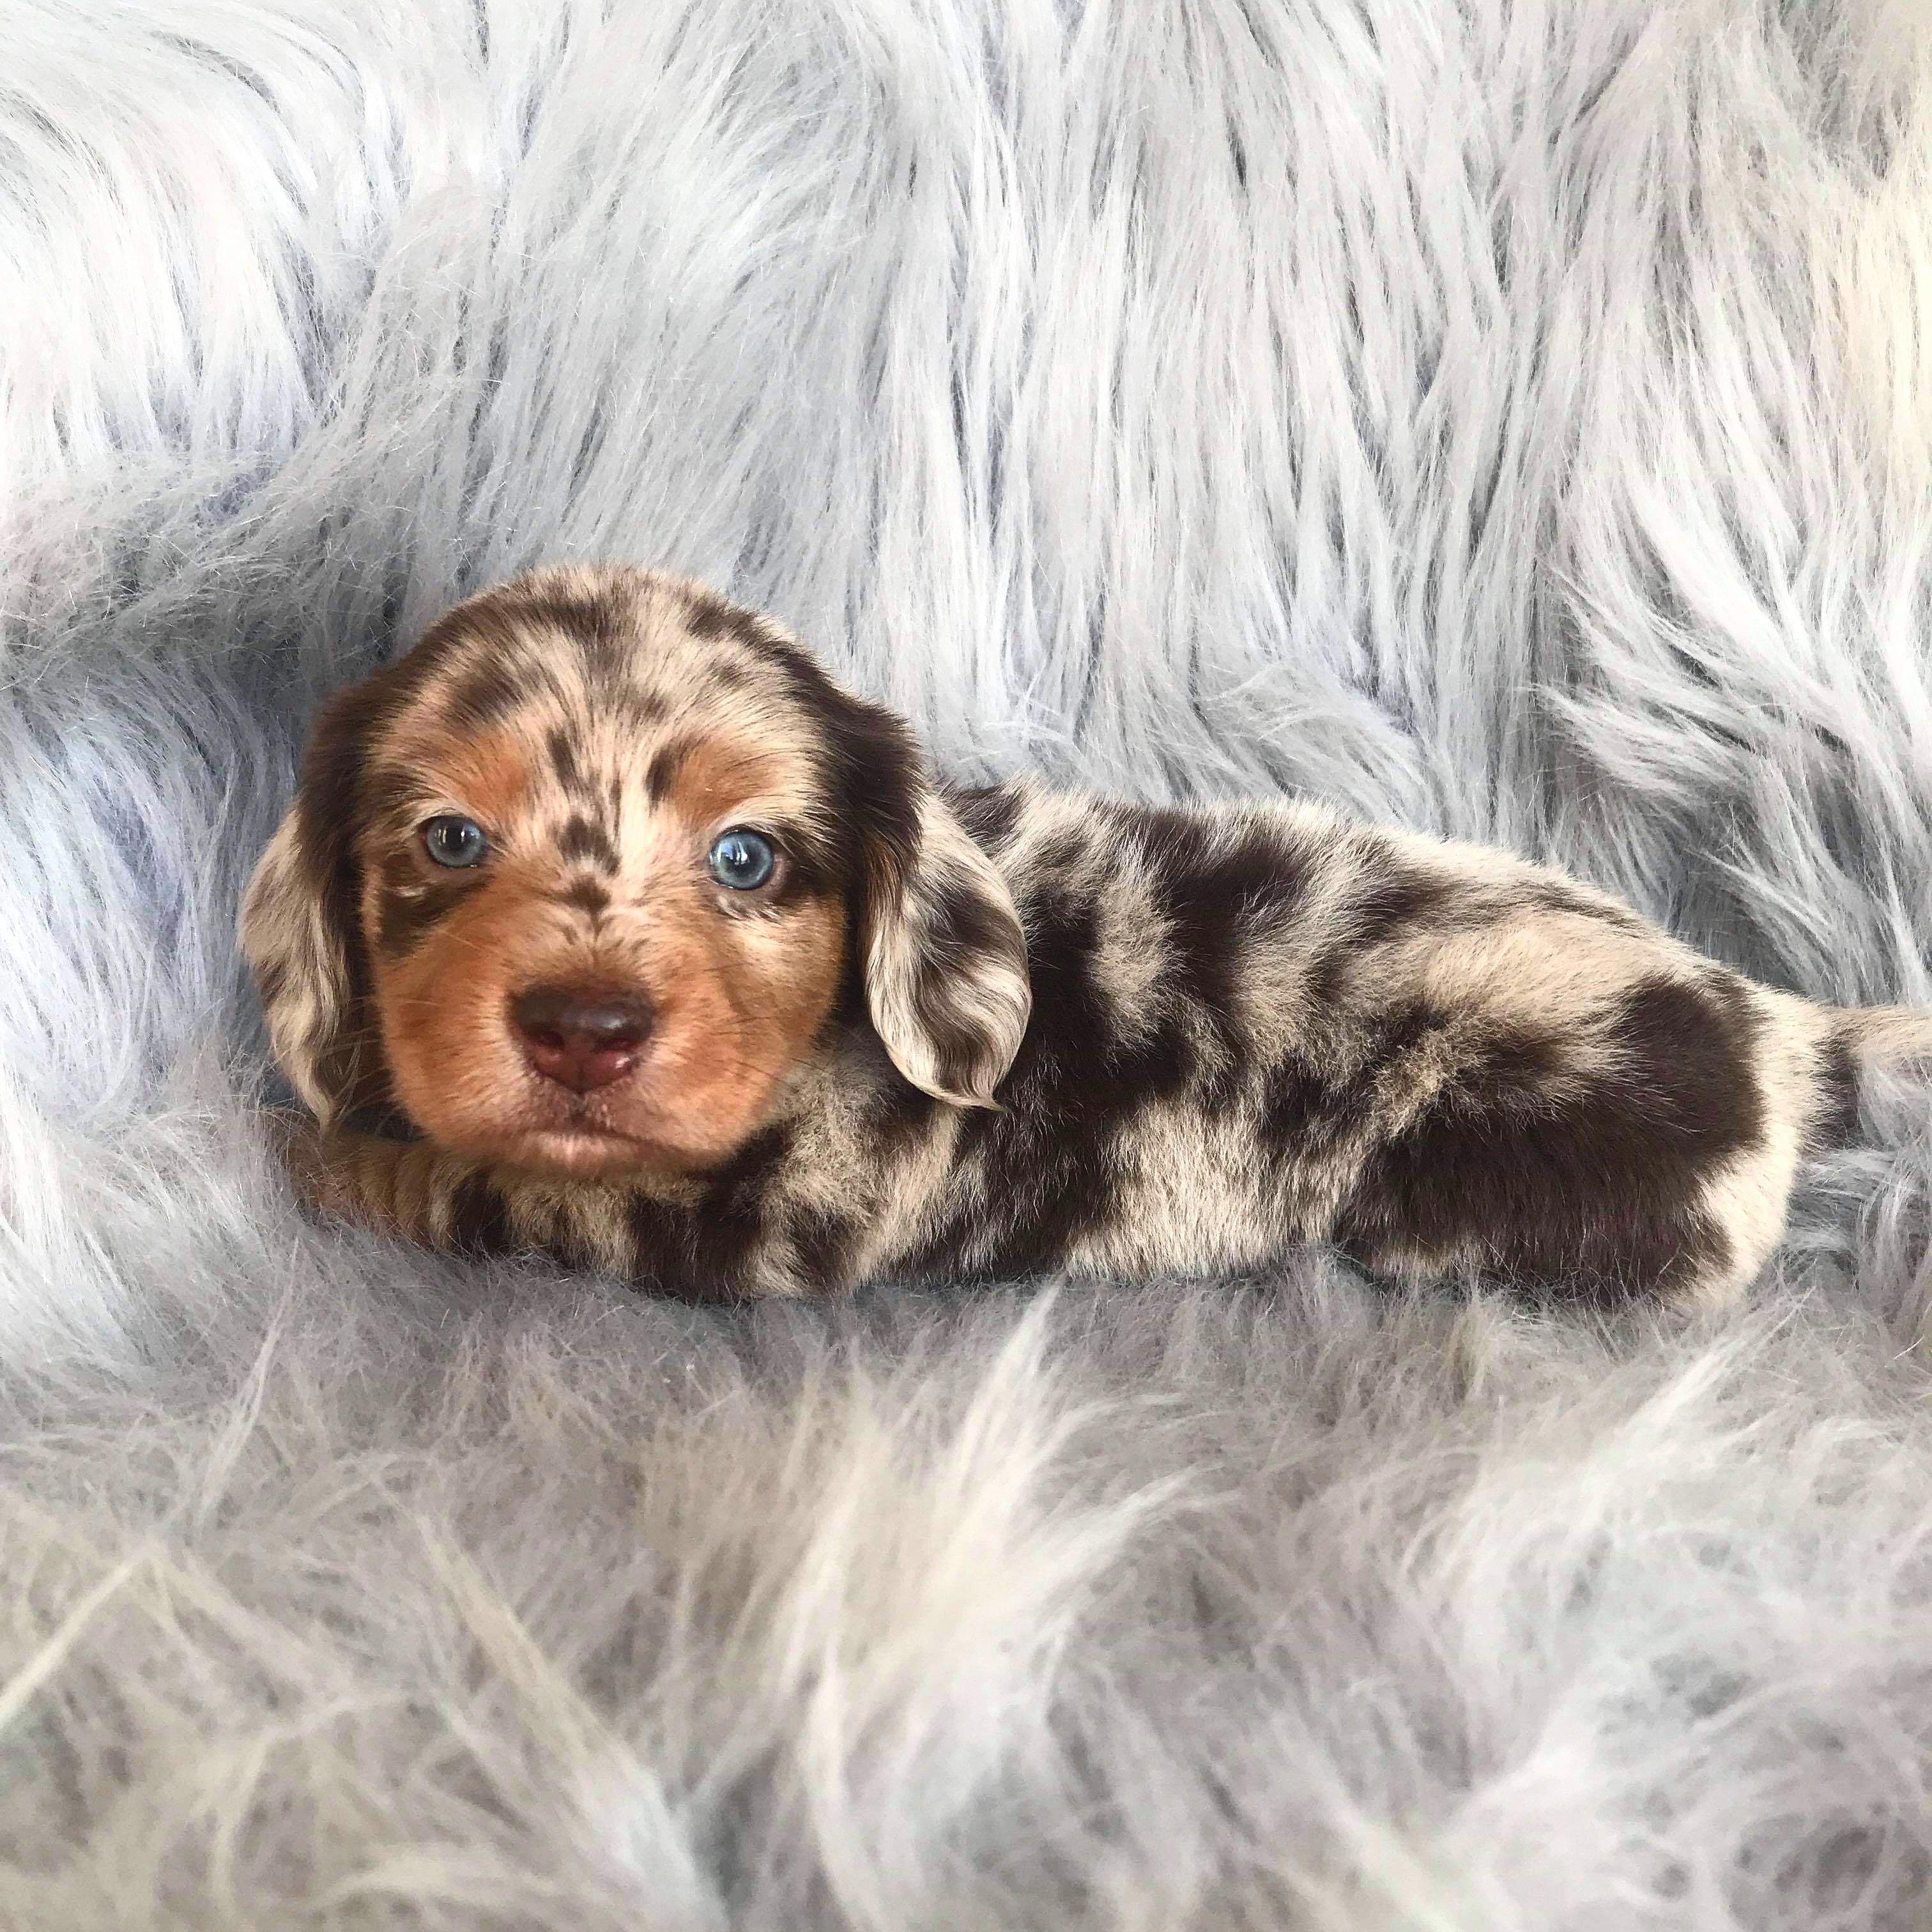 Pin By Tia Arrowsmith On Dog Bed Dachshund Puppies Dapple Dachshund Cute Dogs